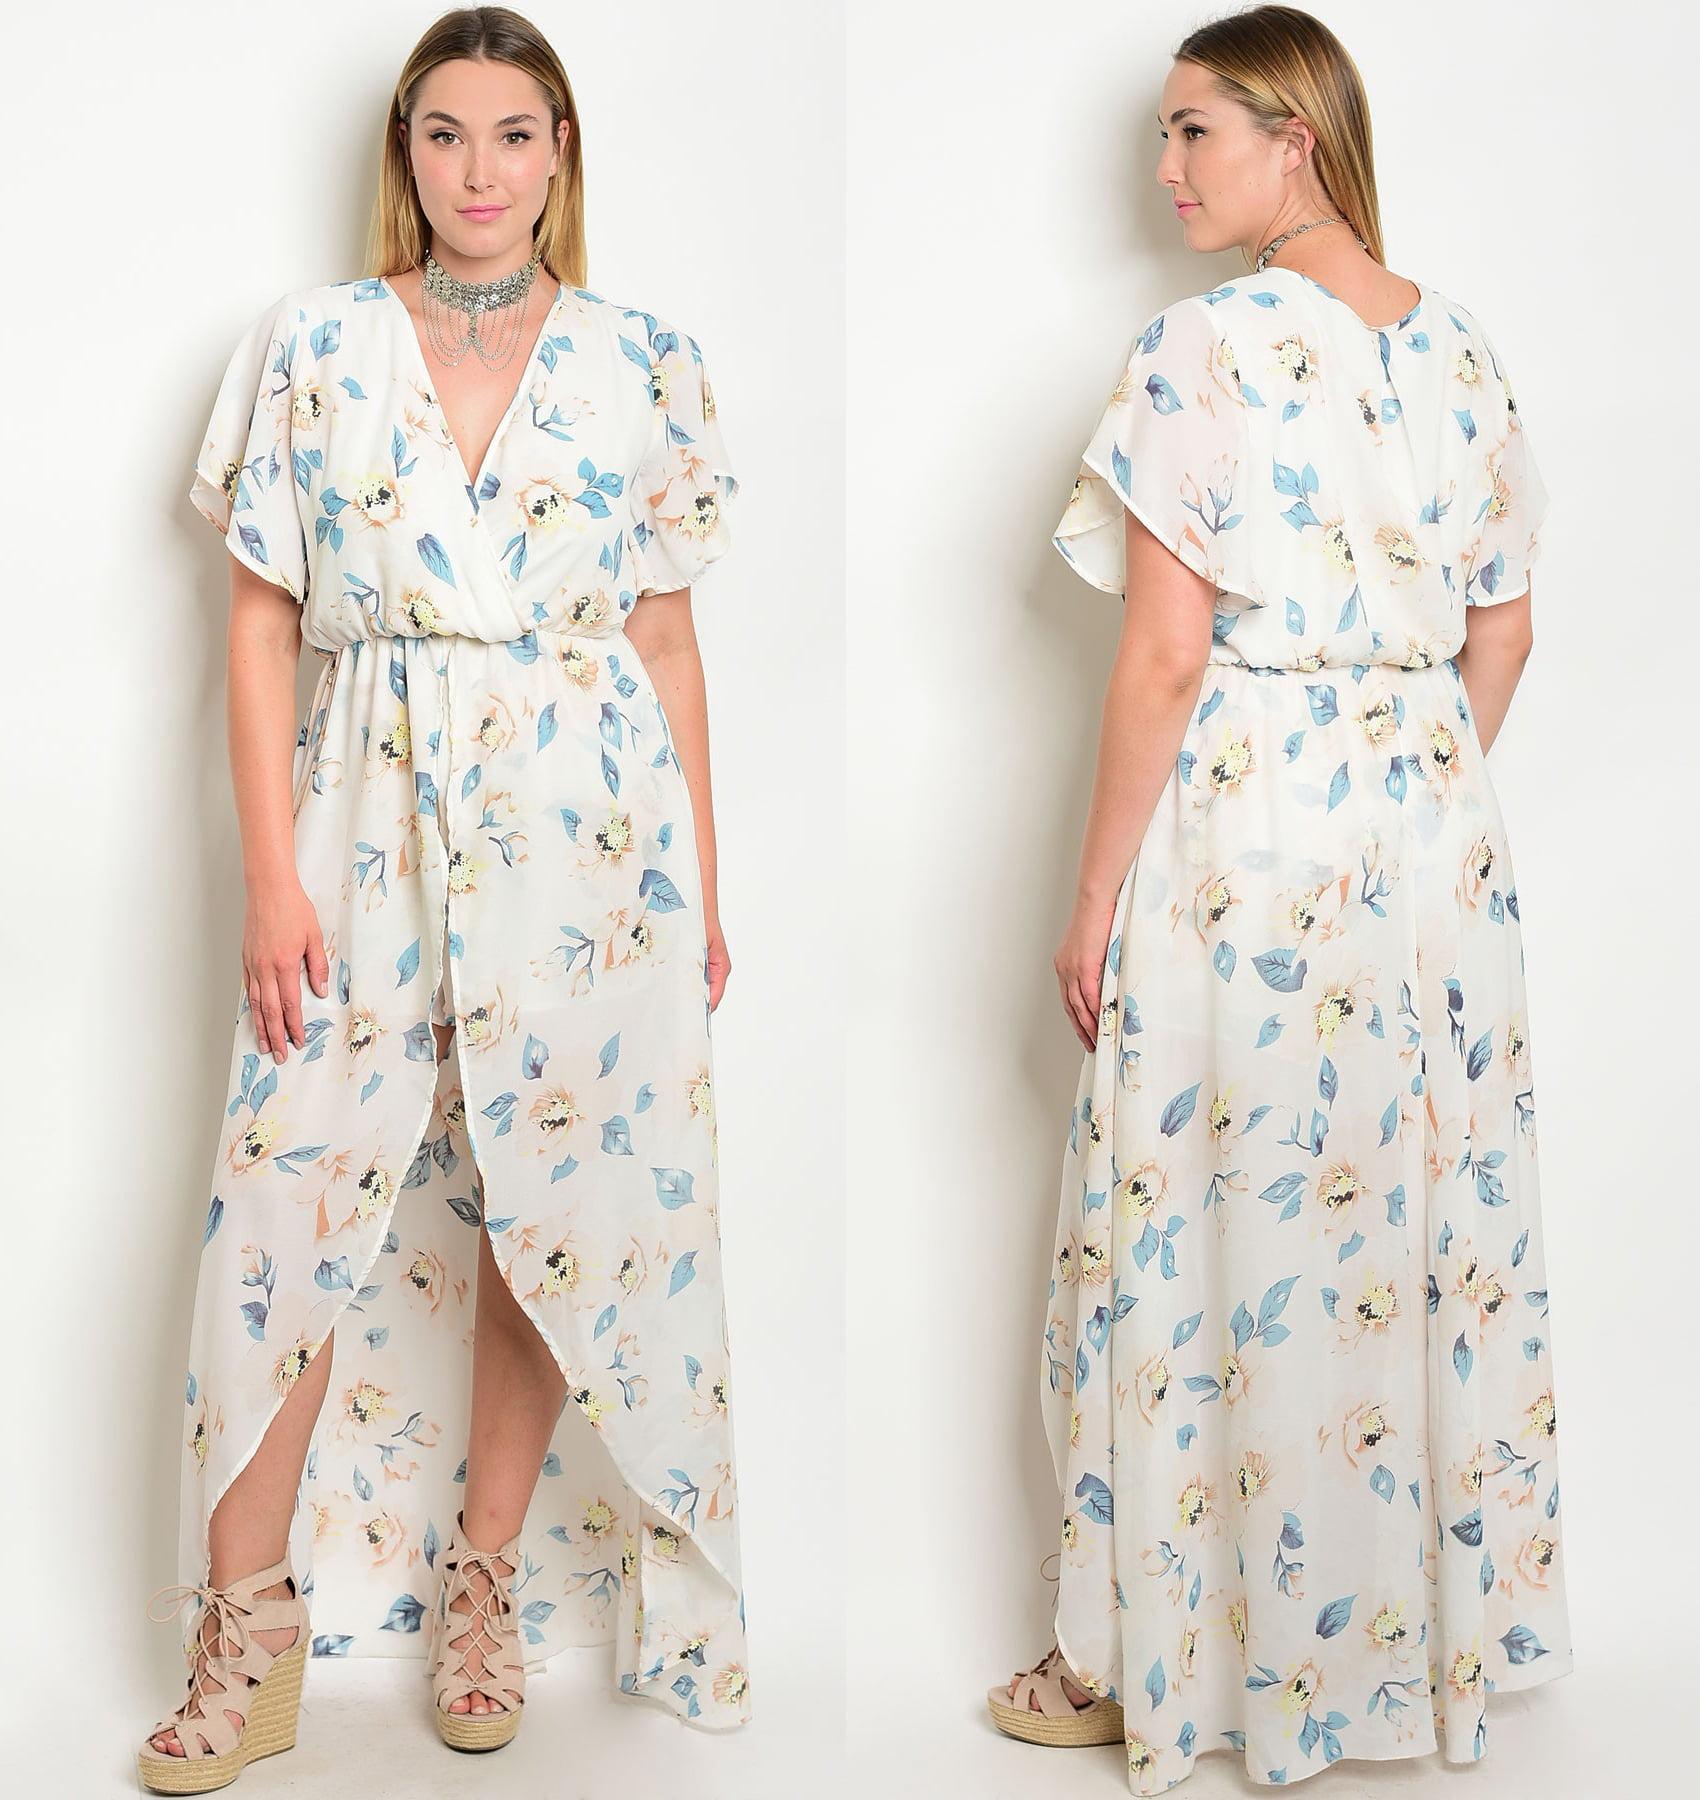 18272aacdbe Floral Romper Maxi Dress Plus Size